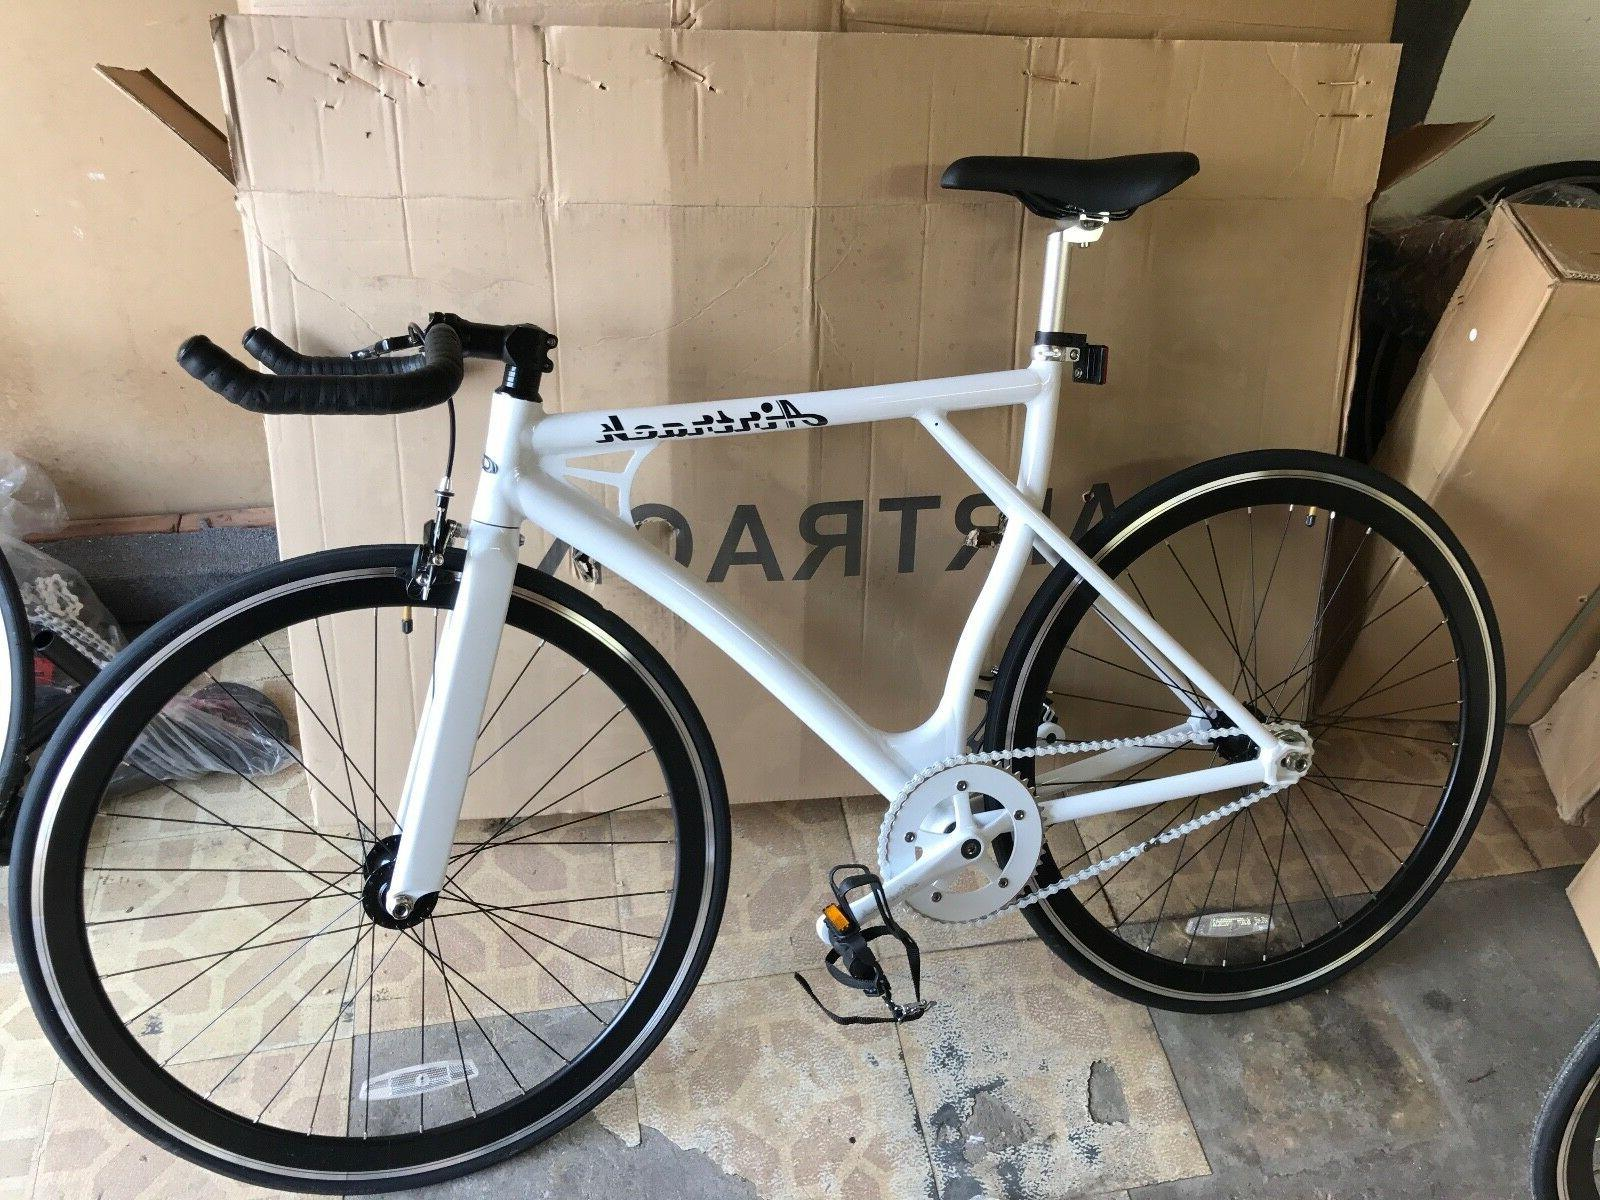 Airtrack Bike Aluminum Road Bicycle Gear cm